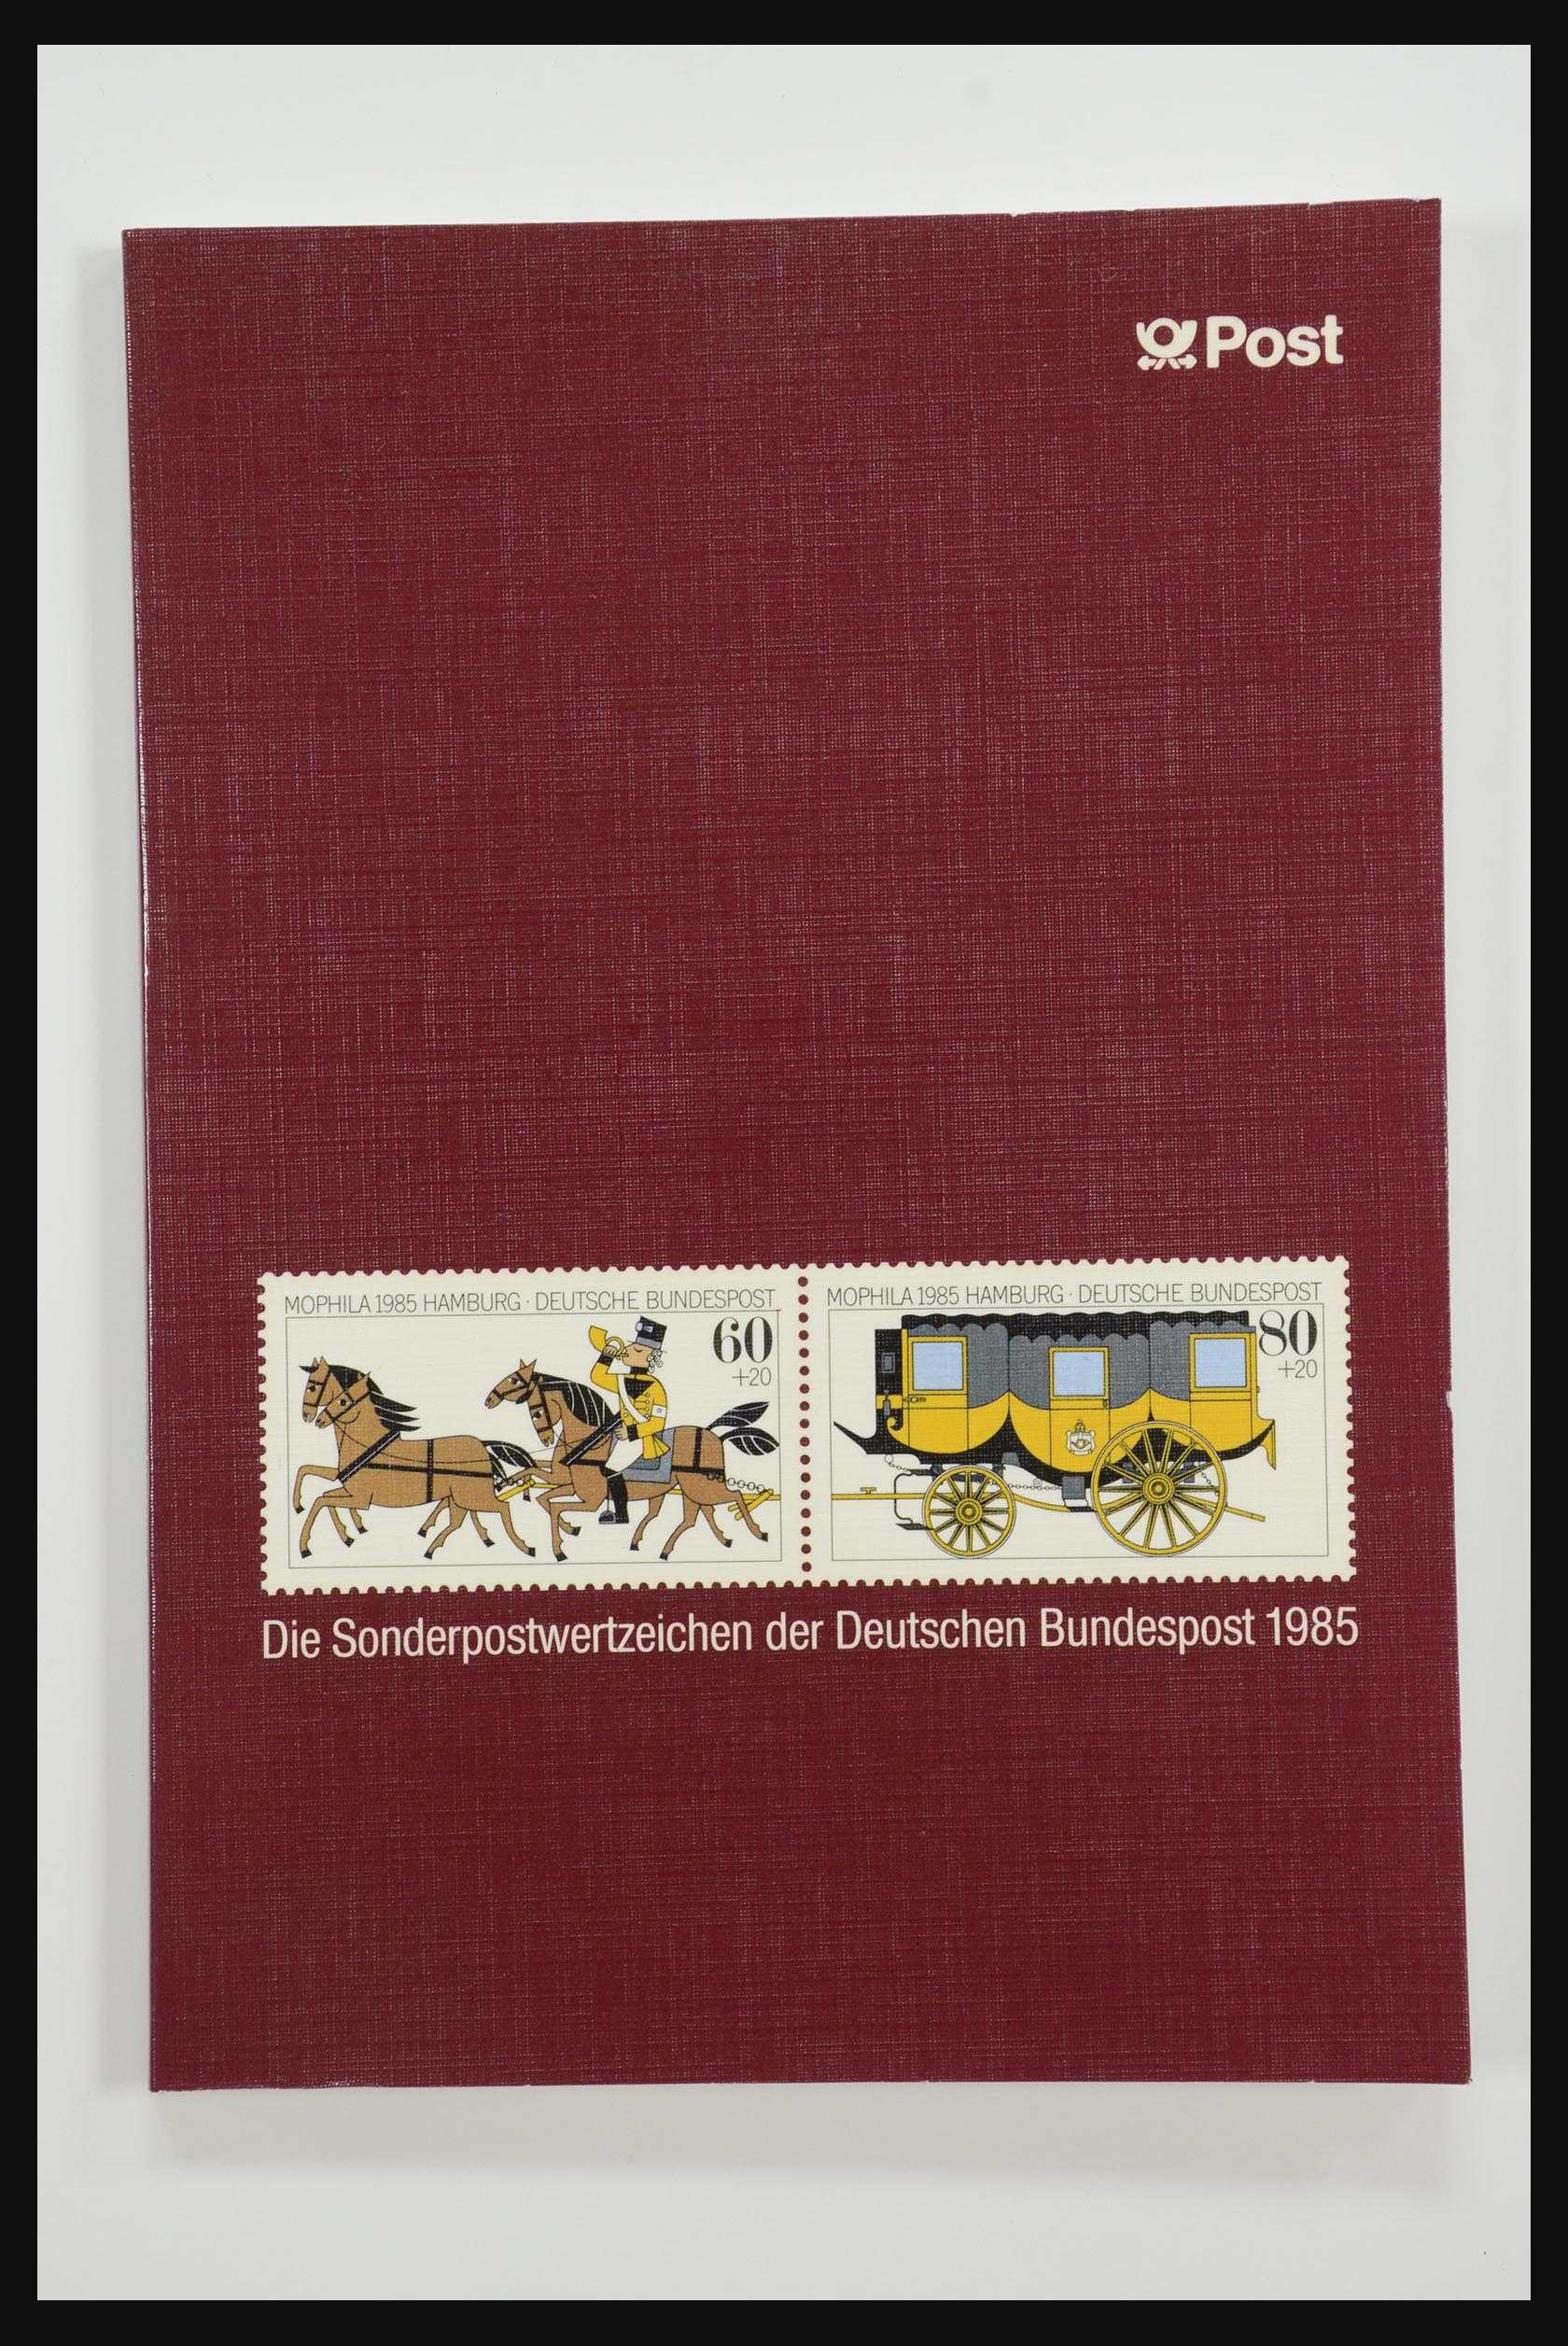 31834 013 - 31834 Bundespost yearbooks 1973(!)-1999.